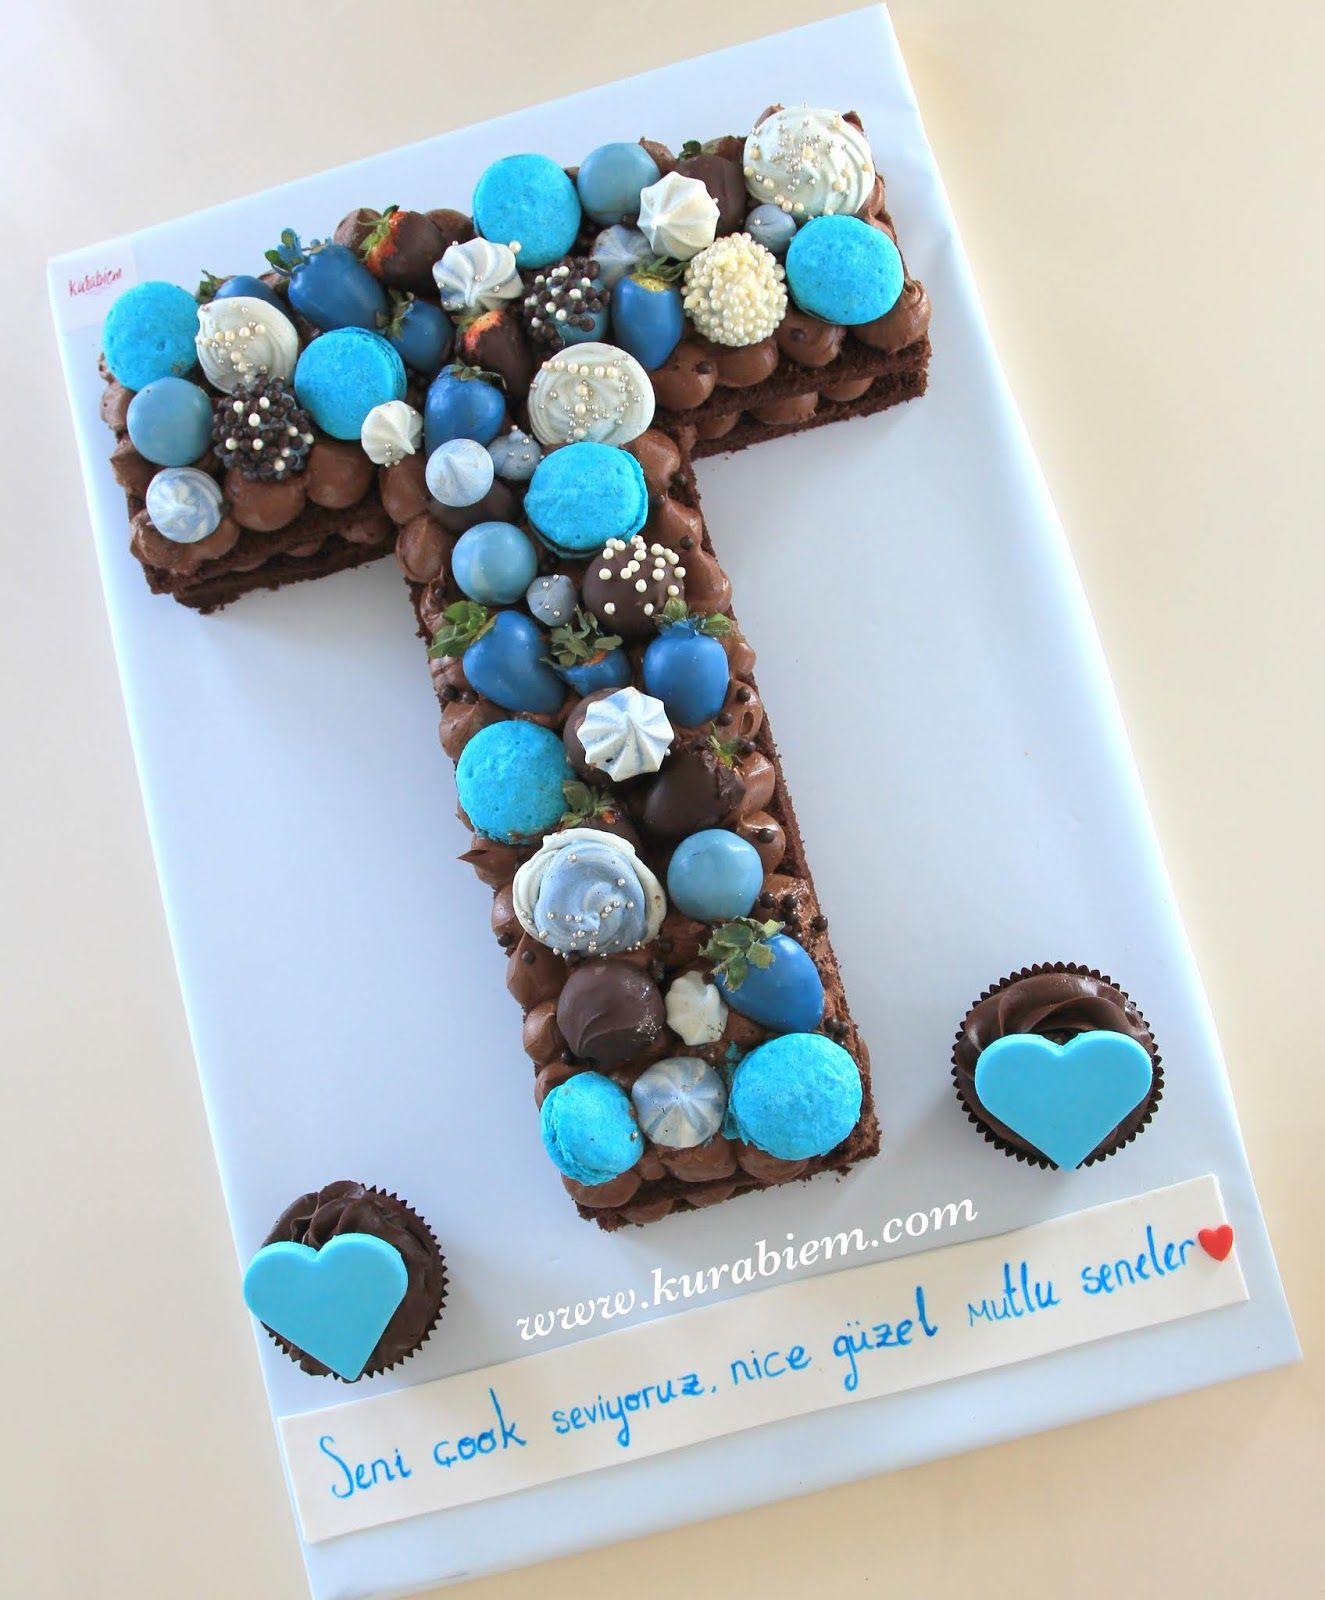 Awe Inspiring Men Birthday Cake Birthday Cake Masculine Cake Alphabet Cake Birthday Cards Printable Riciscafe Filternl